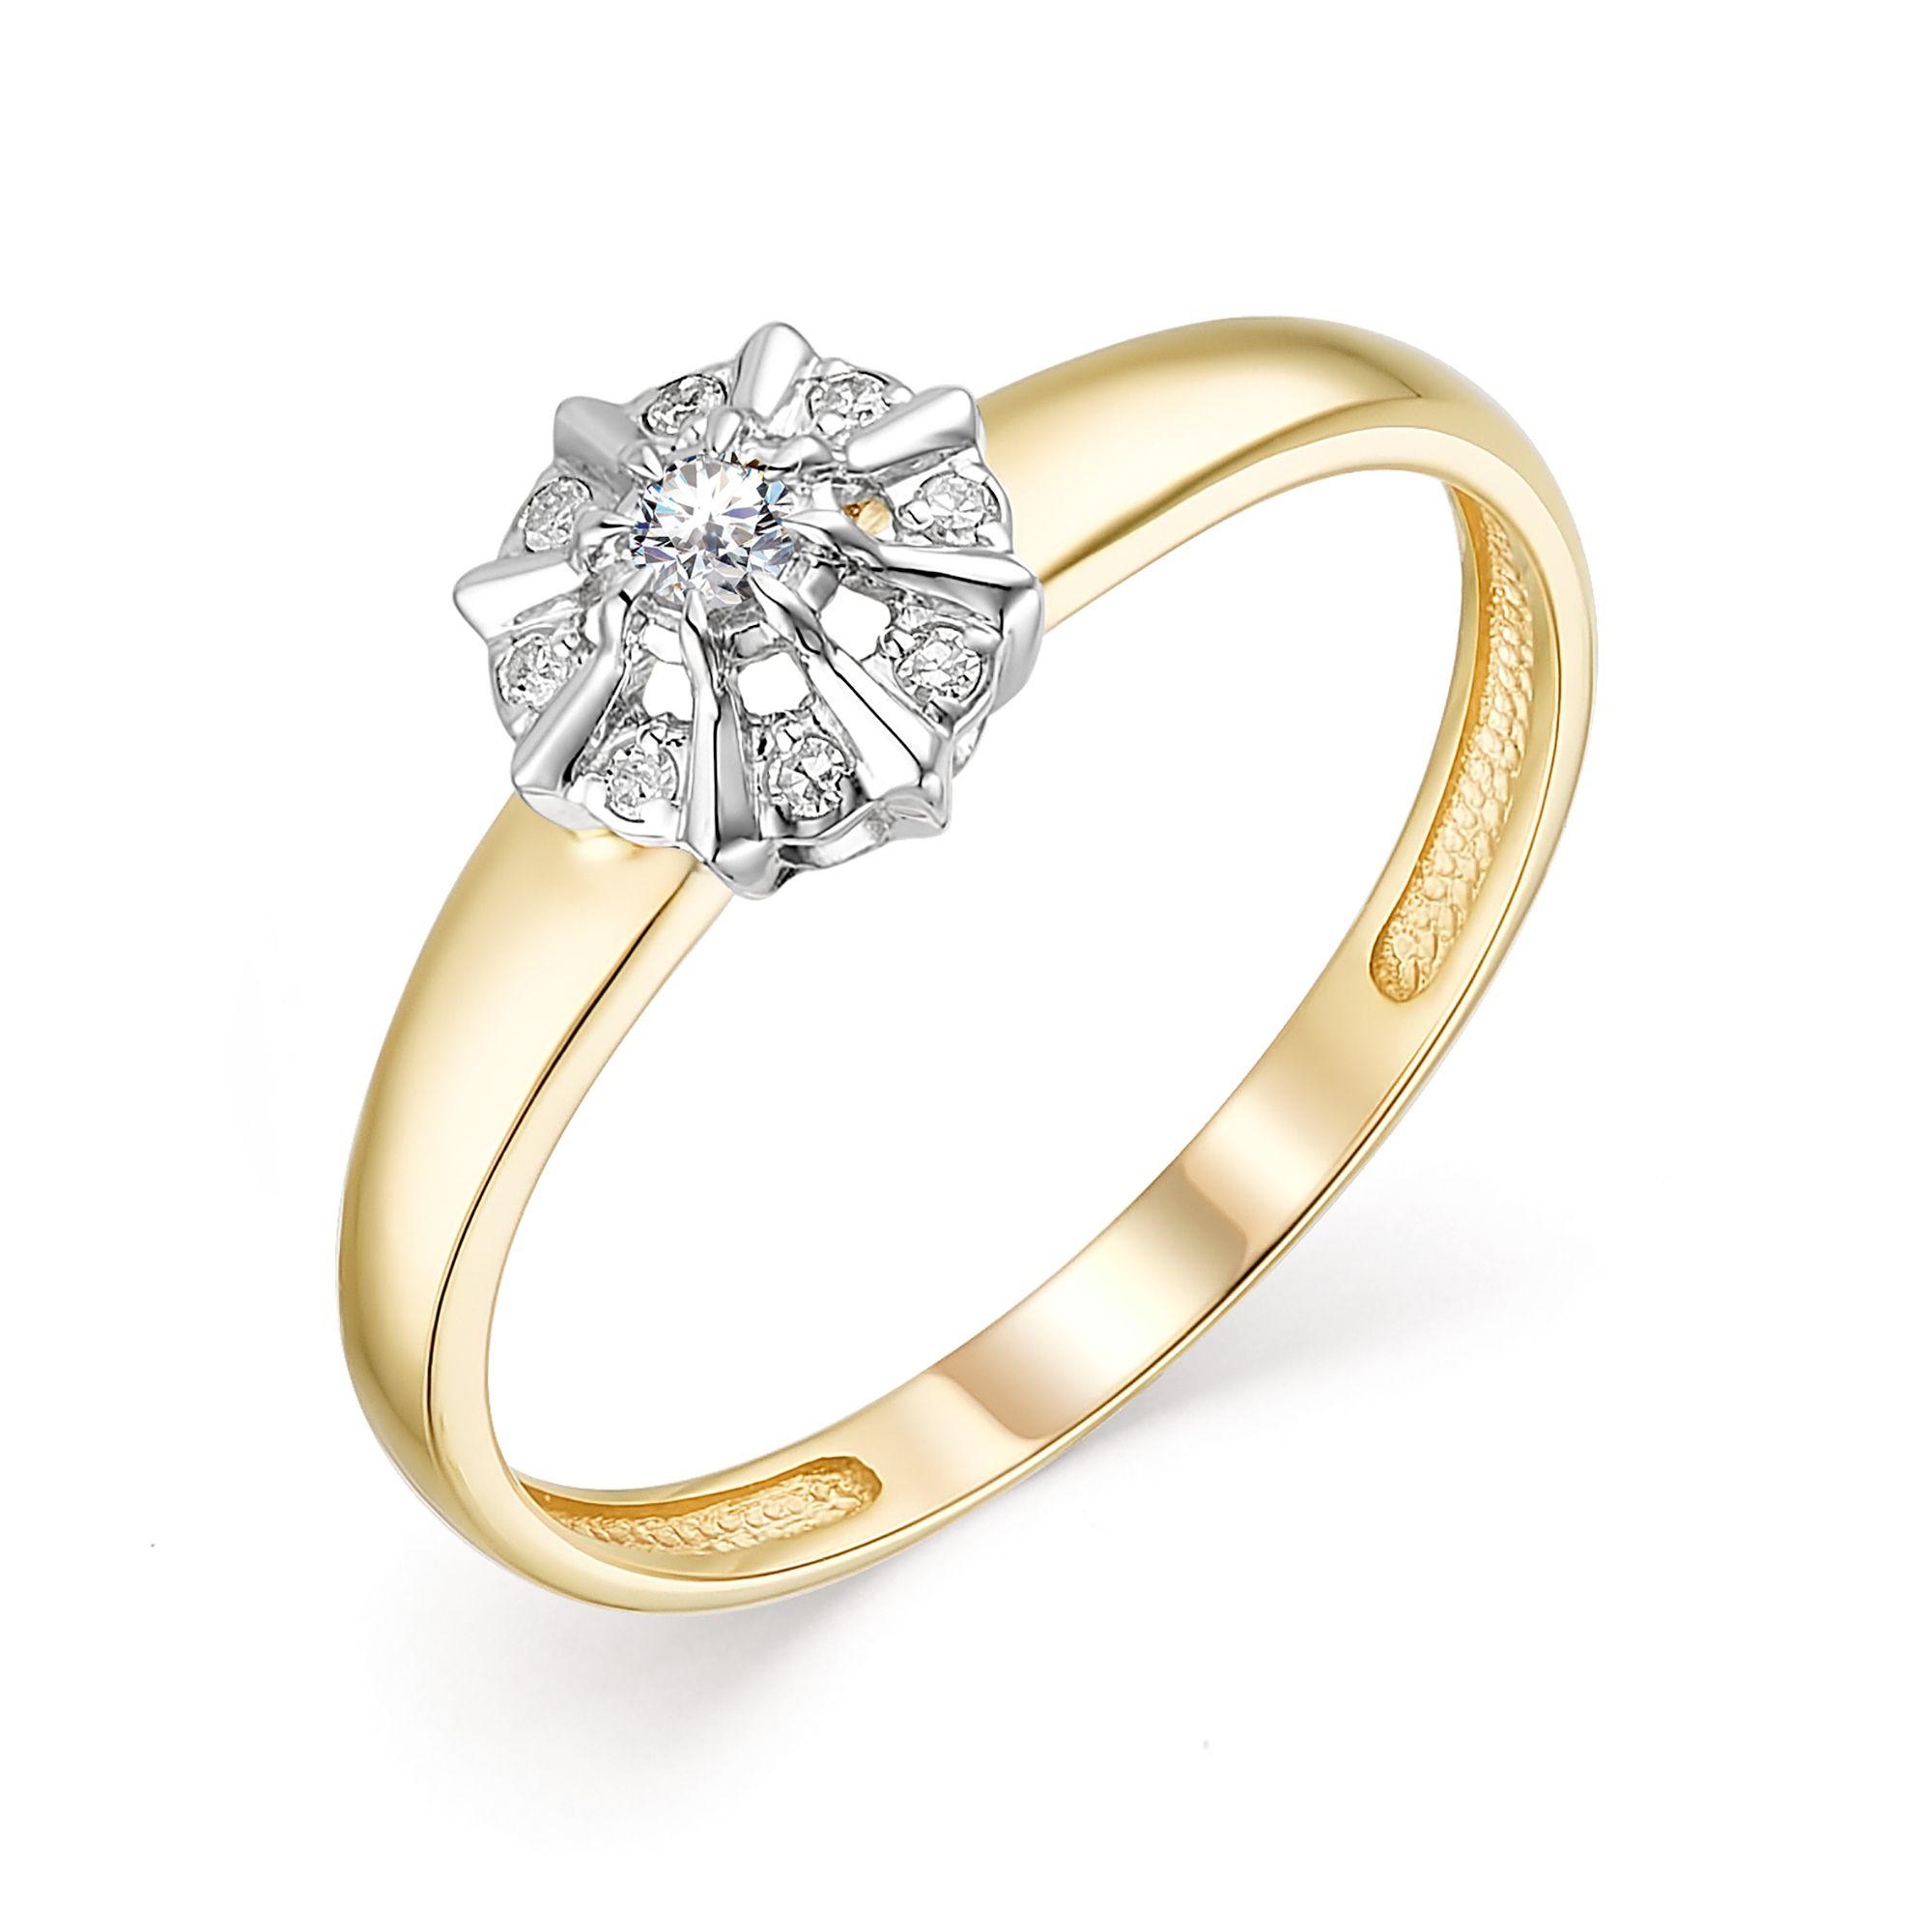 картинка кольцо 13608-300 1 бриллиант круг 57 0,037 25-30 3/6а, 8 бриллиант круг 17 0,037 200-400 2/3а 13608-300